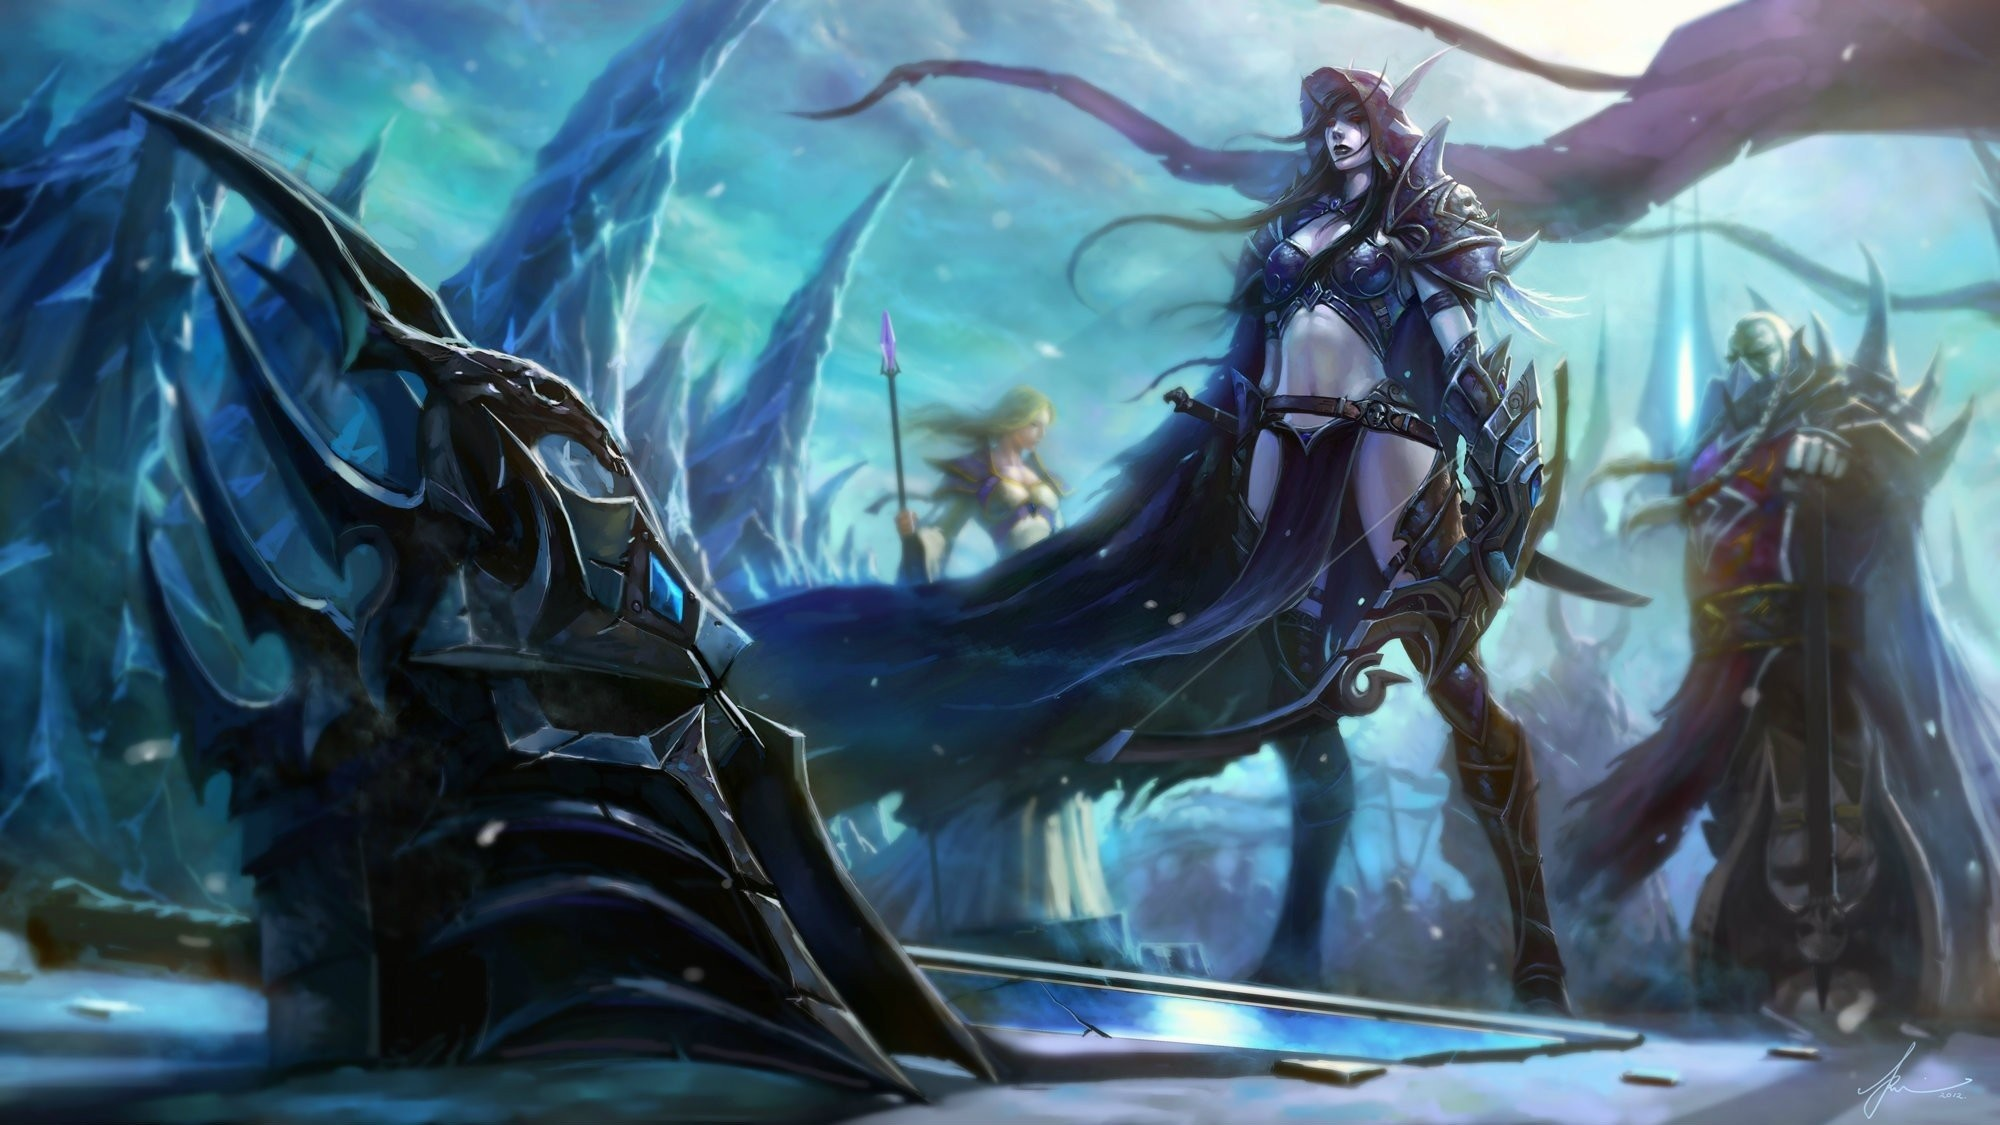 Res: 2000x1125, world of warcraft lich king lady sylvanas varok saurfang jaina proudmoore